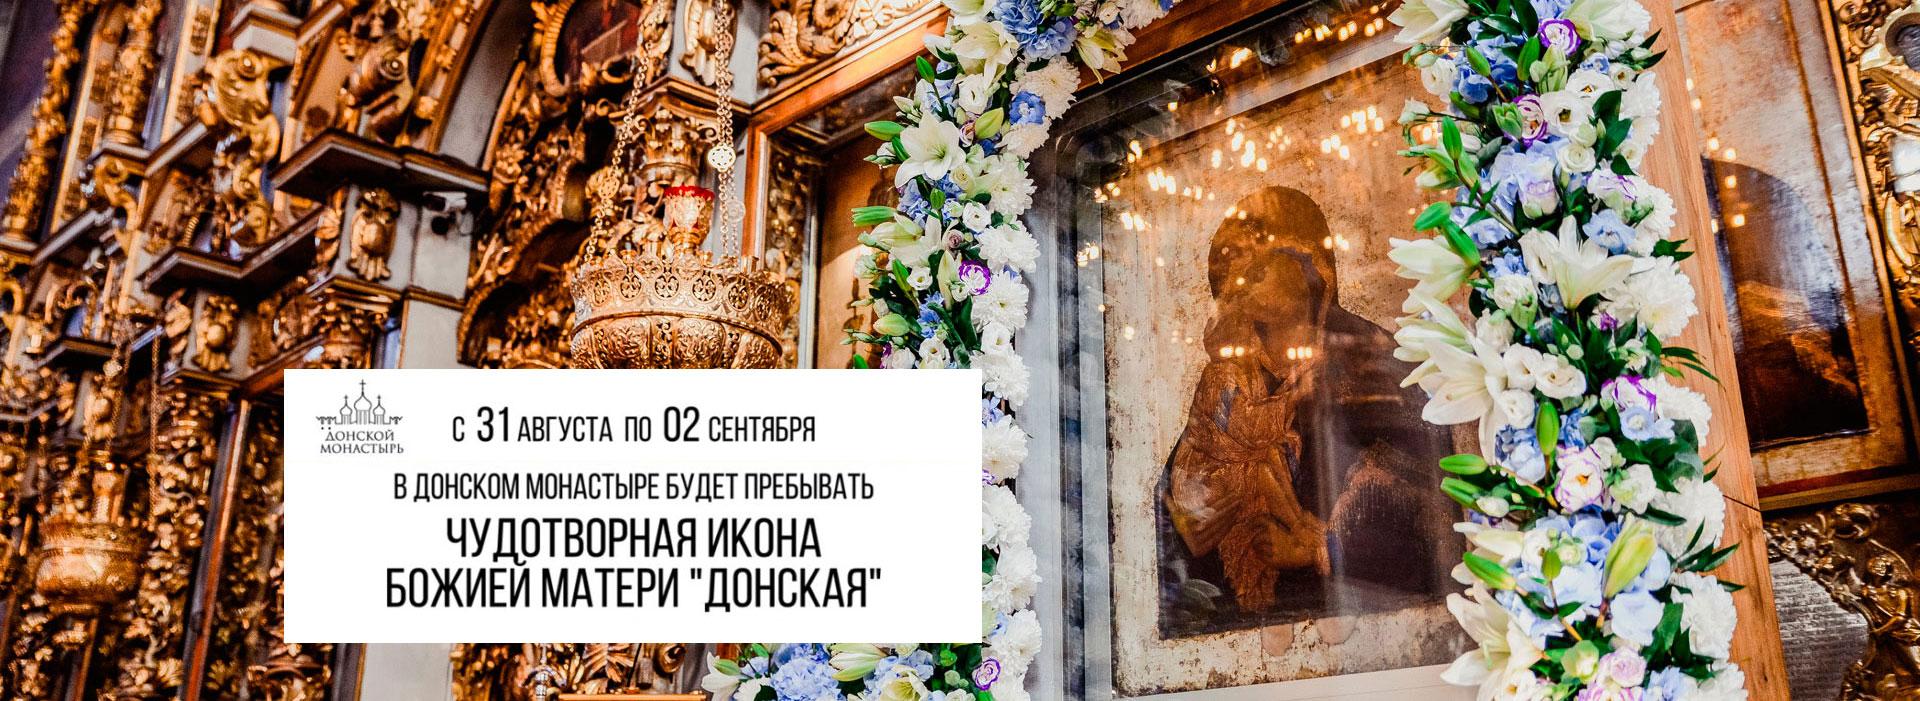 slider-donskaya-ikona-bozhiey-matery